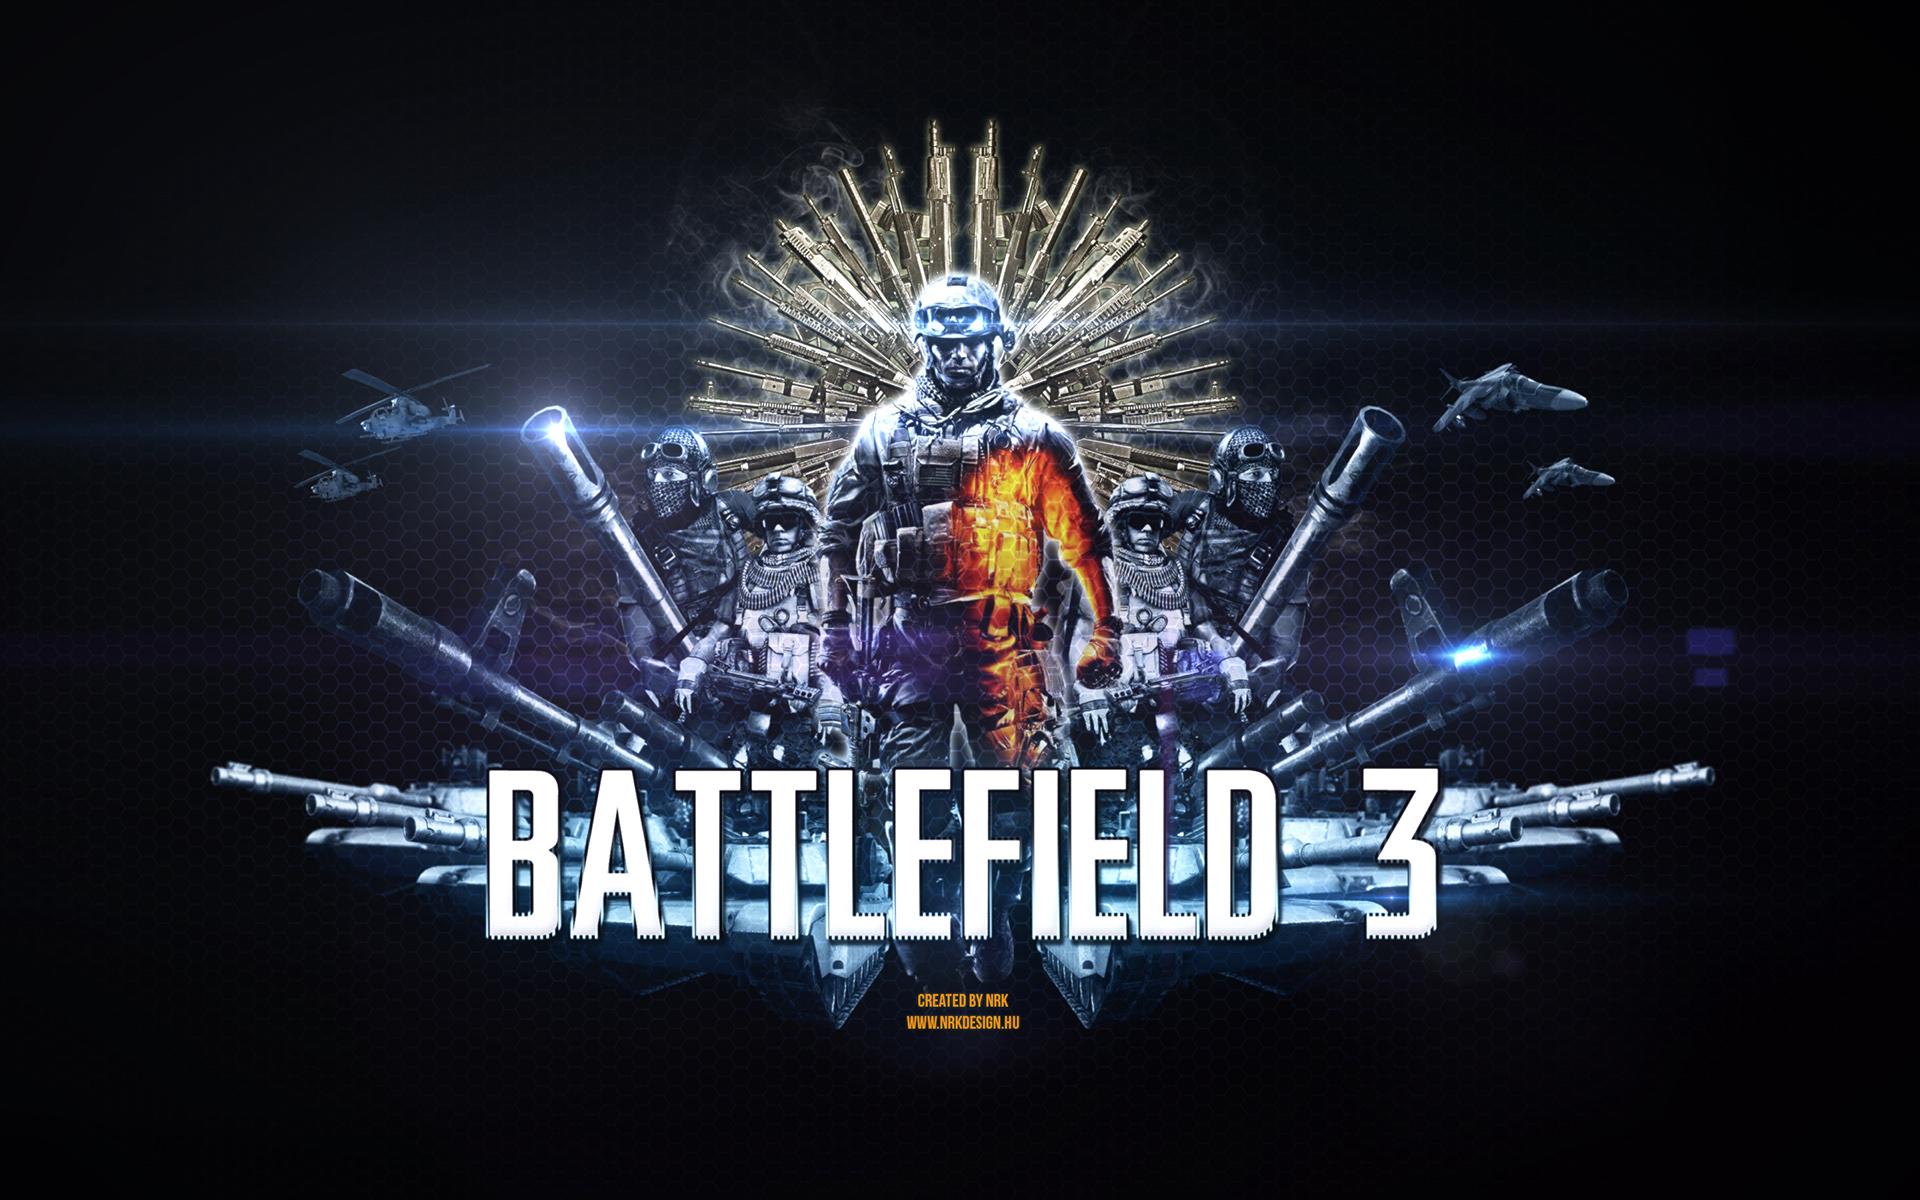 Ultimate Battlefield 3 Wallpapers HD Wallpapers 1920x1200